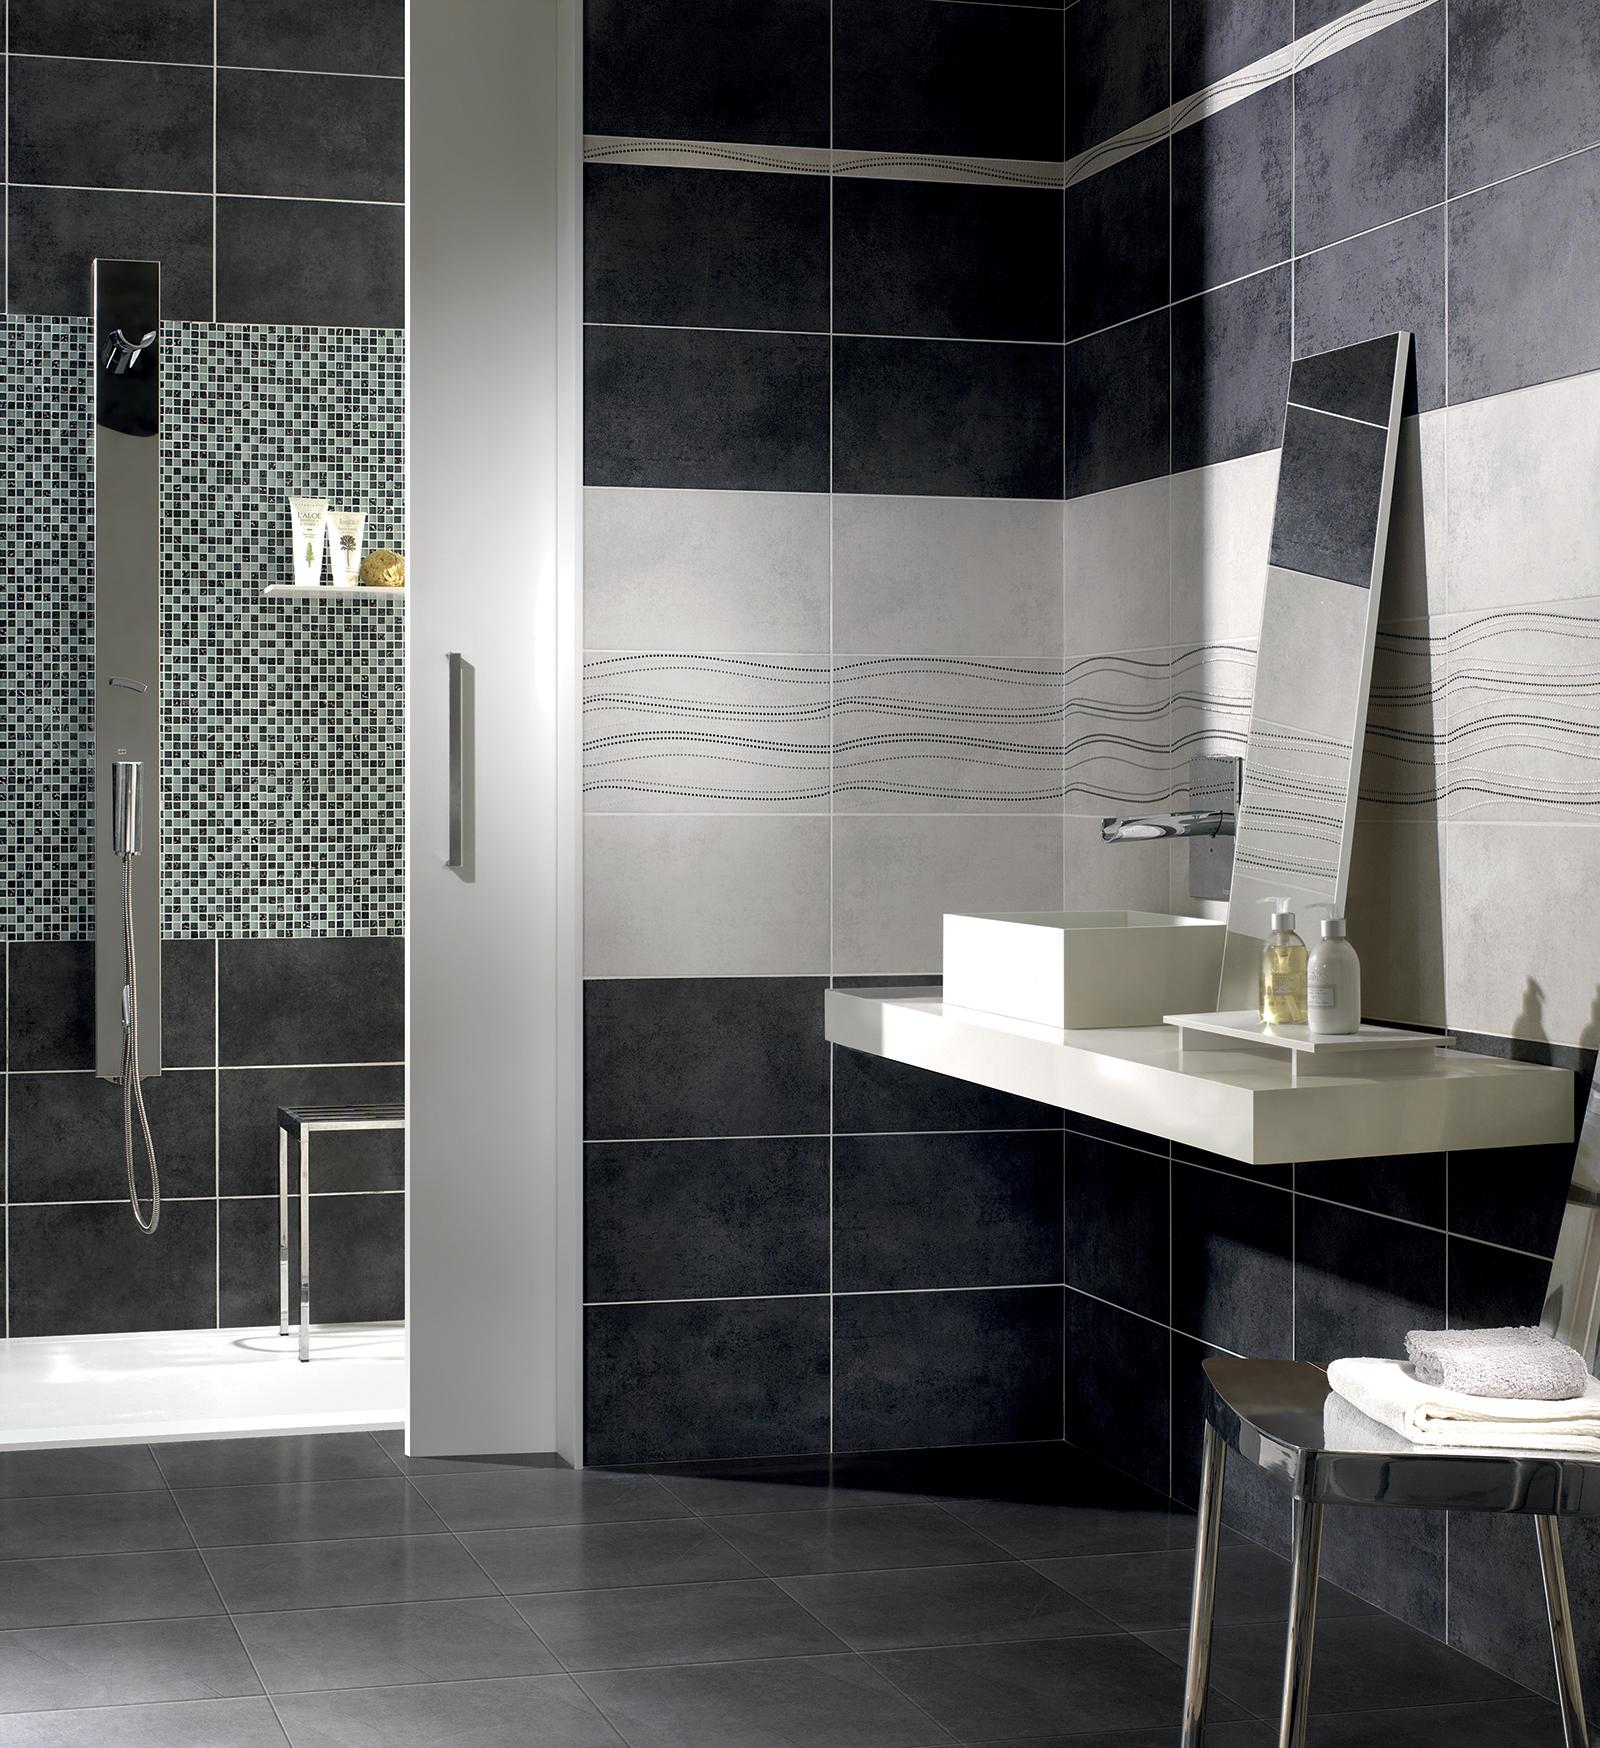 Serie mizar pavimenti e rivestimenti armonie by arte casa - Rivestimento bagno grigio ...